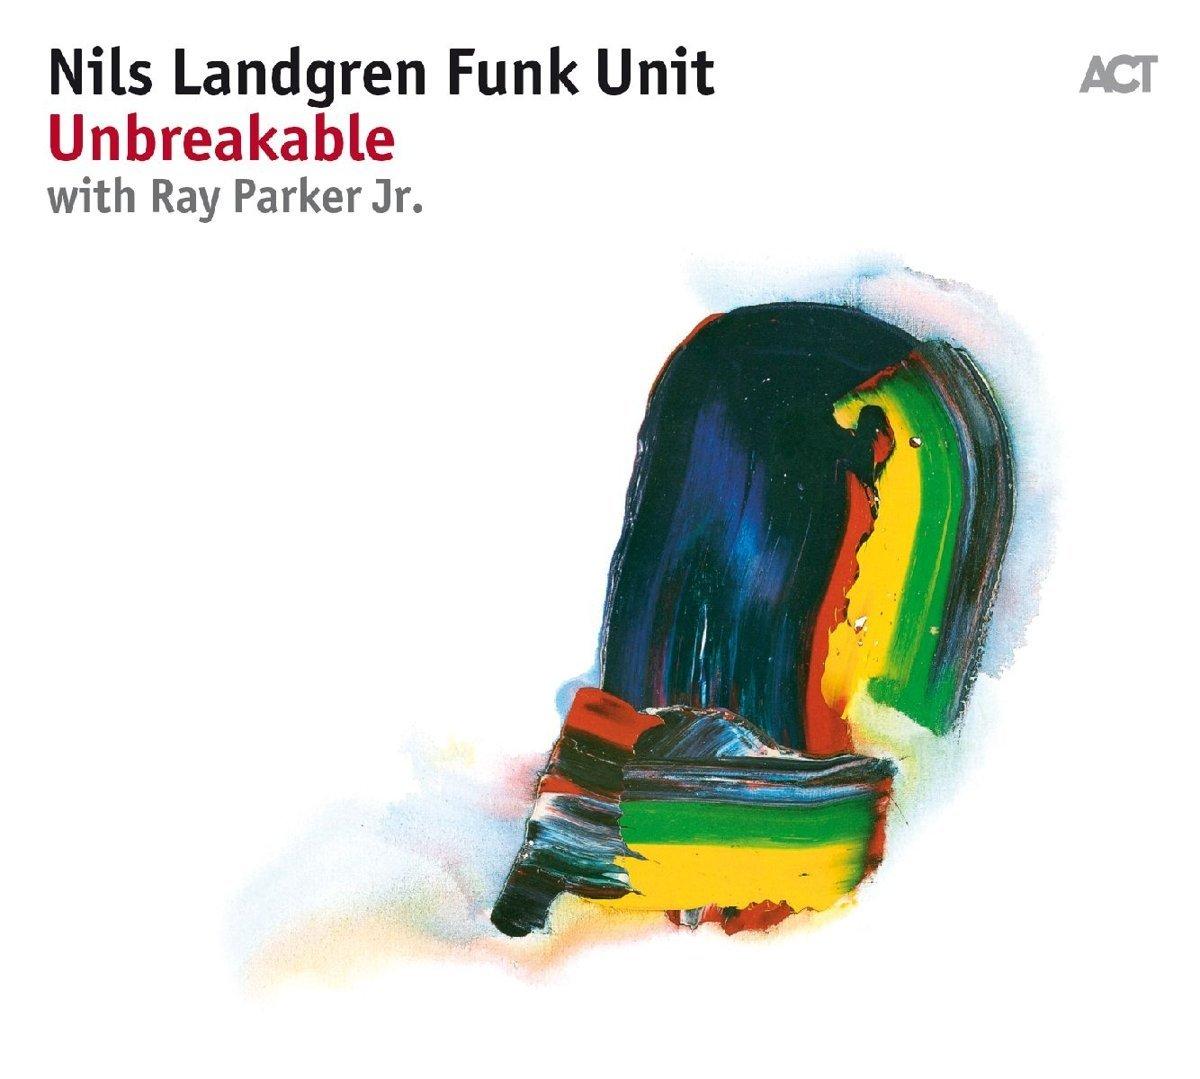 NILS LANDGREN - Nils Landgren Funk Unit : Unbreakable cover